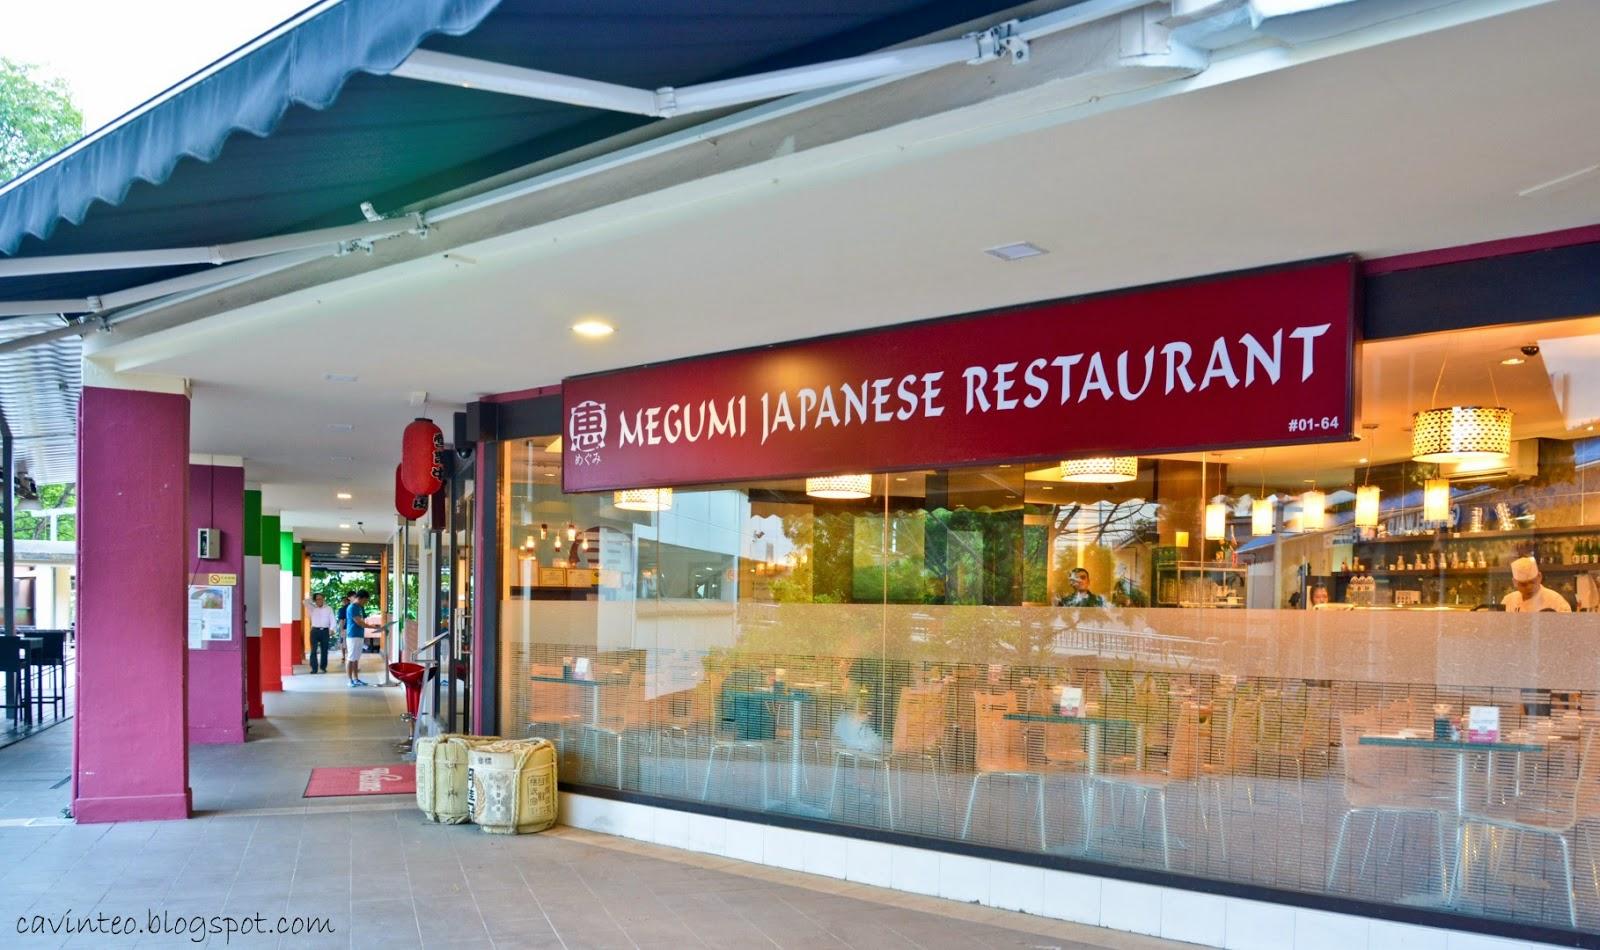 Megumi Japanese Restaurant Sunset